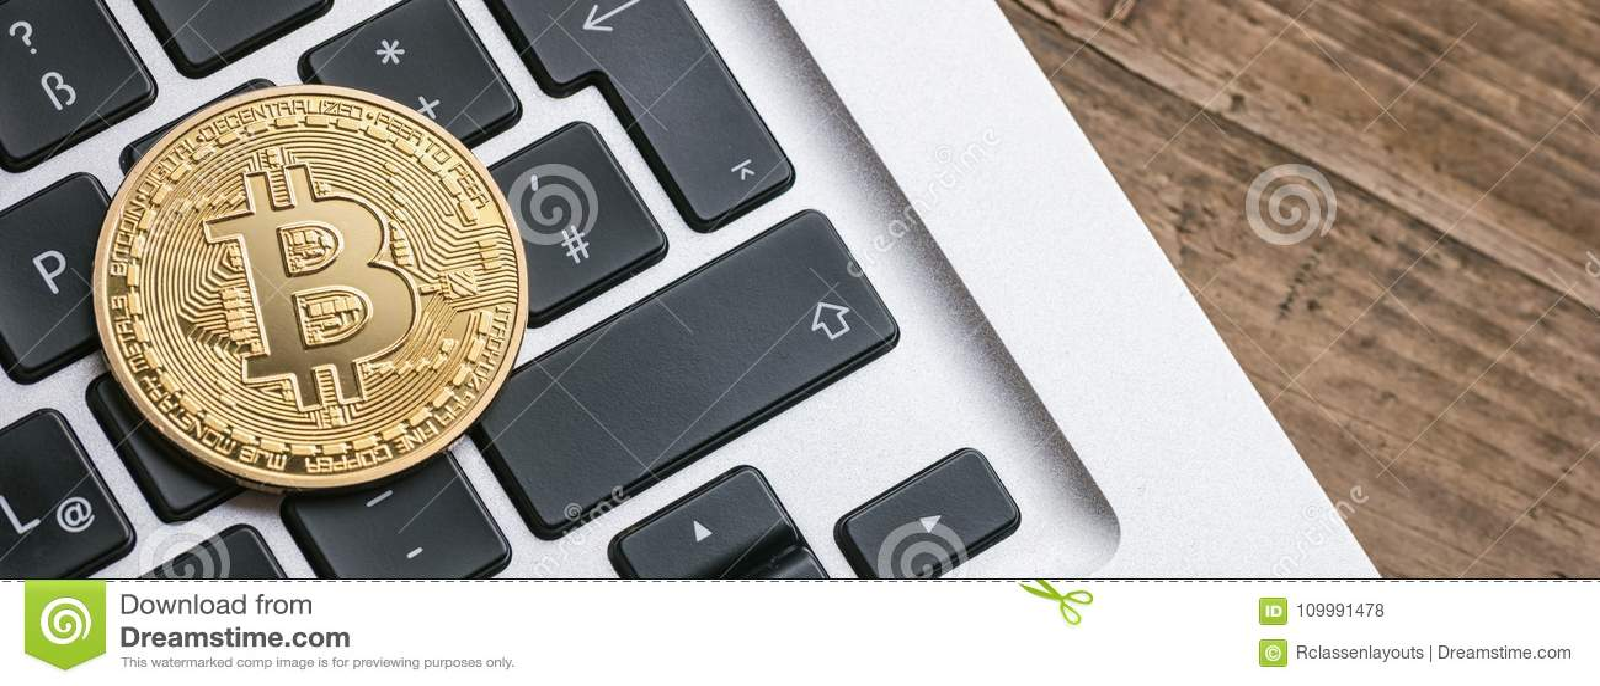 Cryptocurrency Bitcoin di Digital su un taccuino